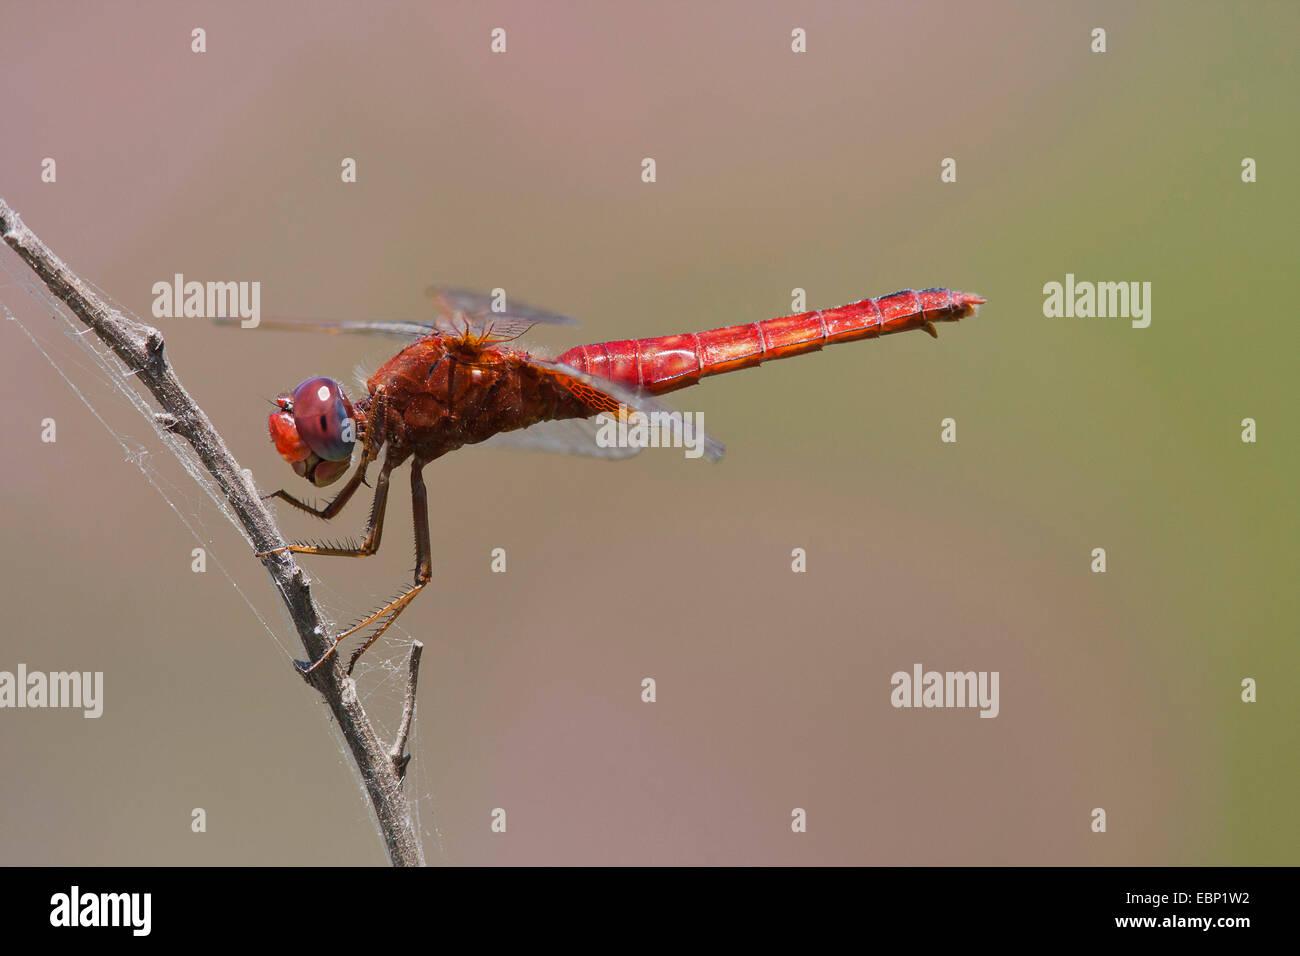 Broad Scarlet, Common Scarlet-darter, Scarlet Darter, Scarlet Dragonfly (Crocothemis erythraea, Croccothemis erythraea), Stock Photo